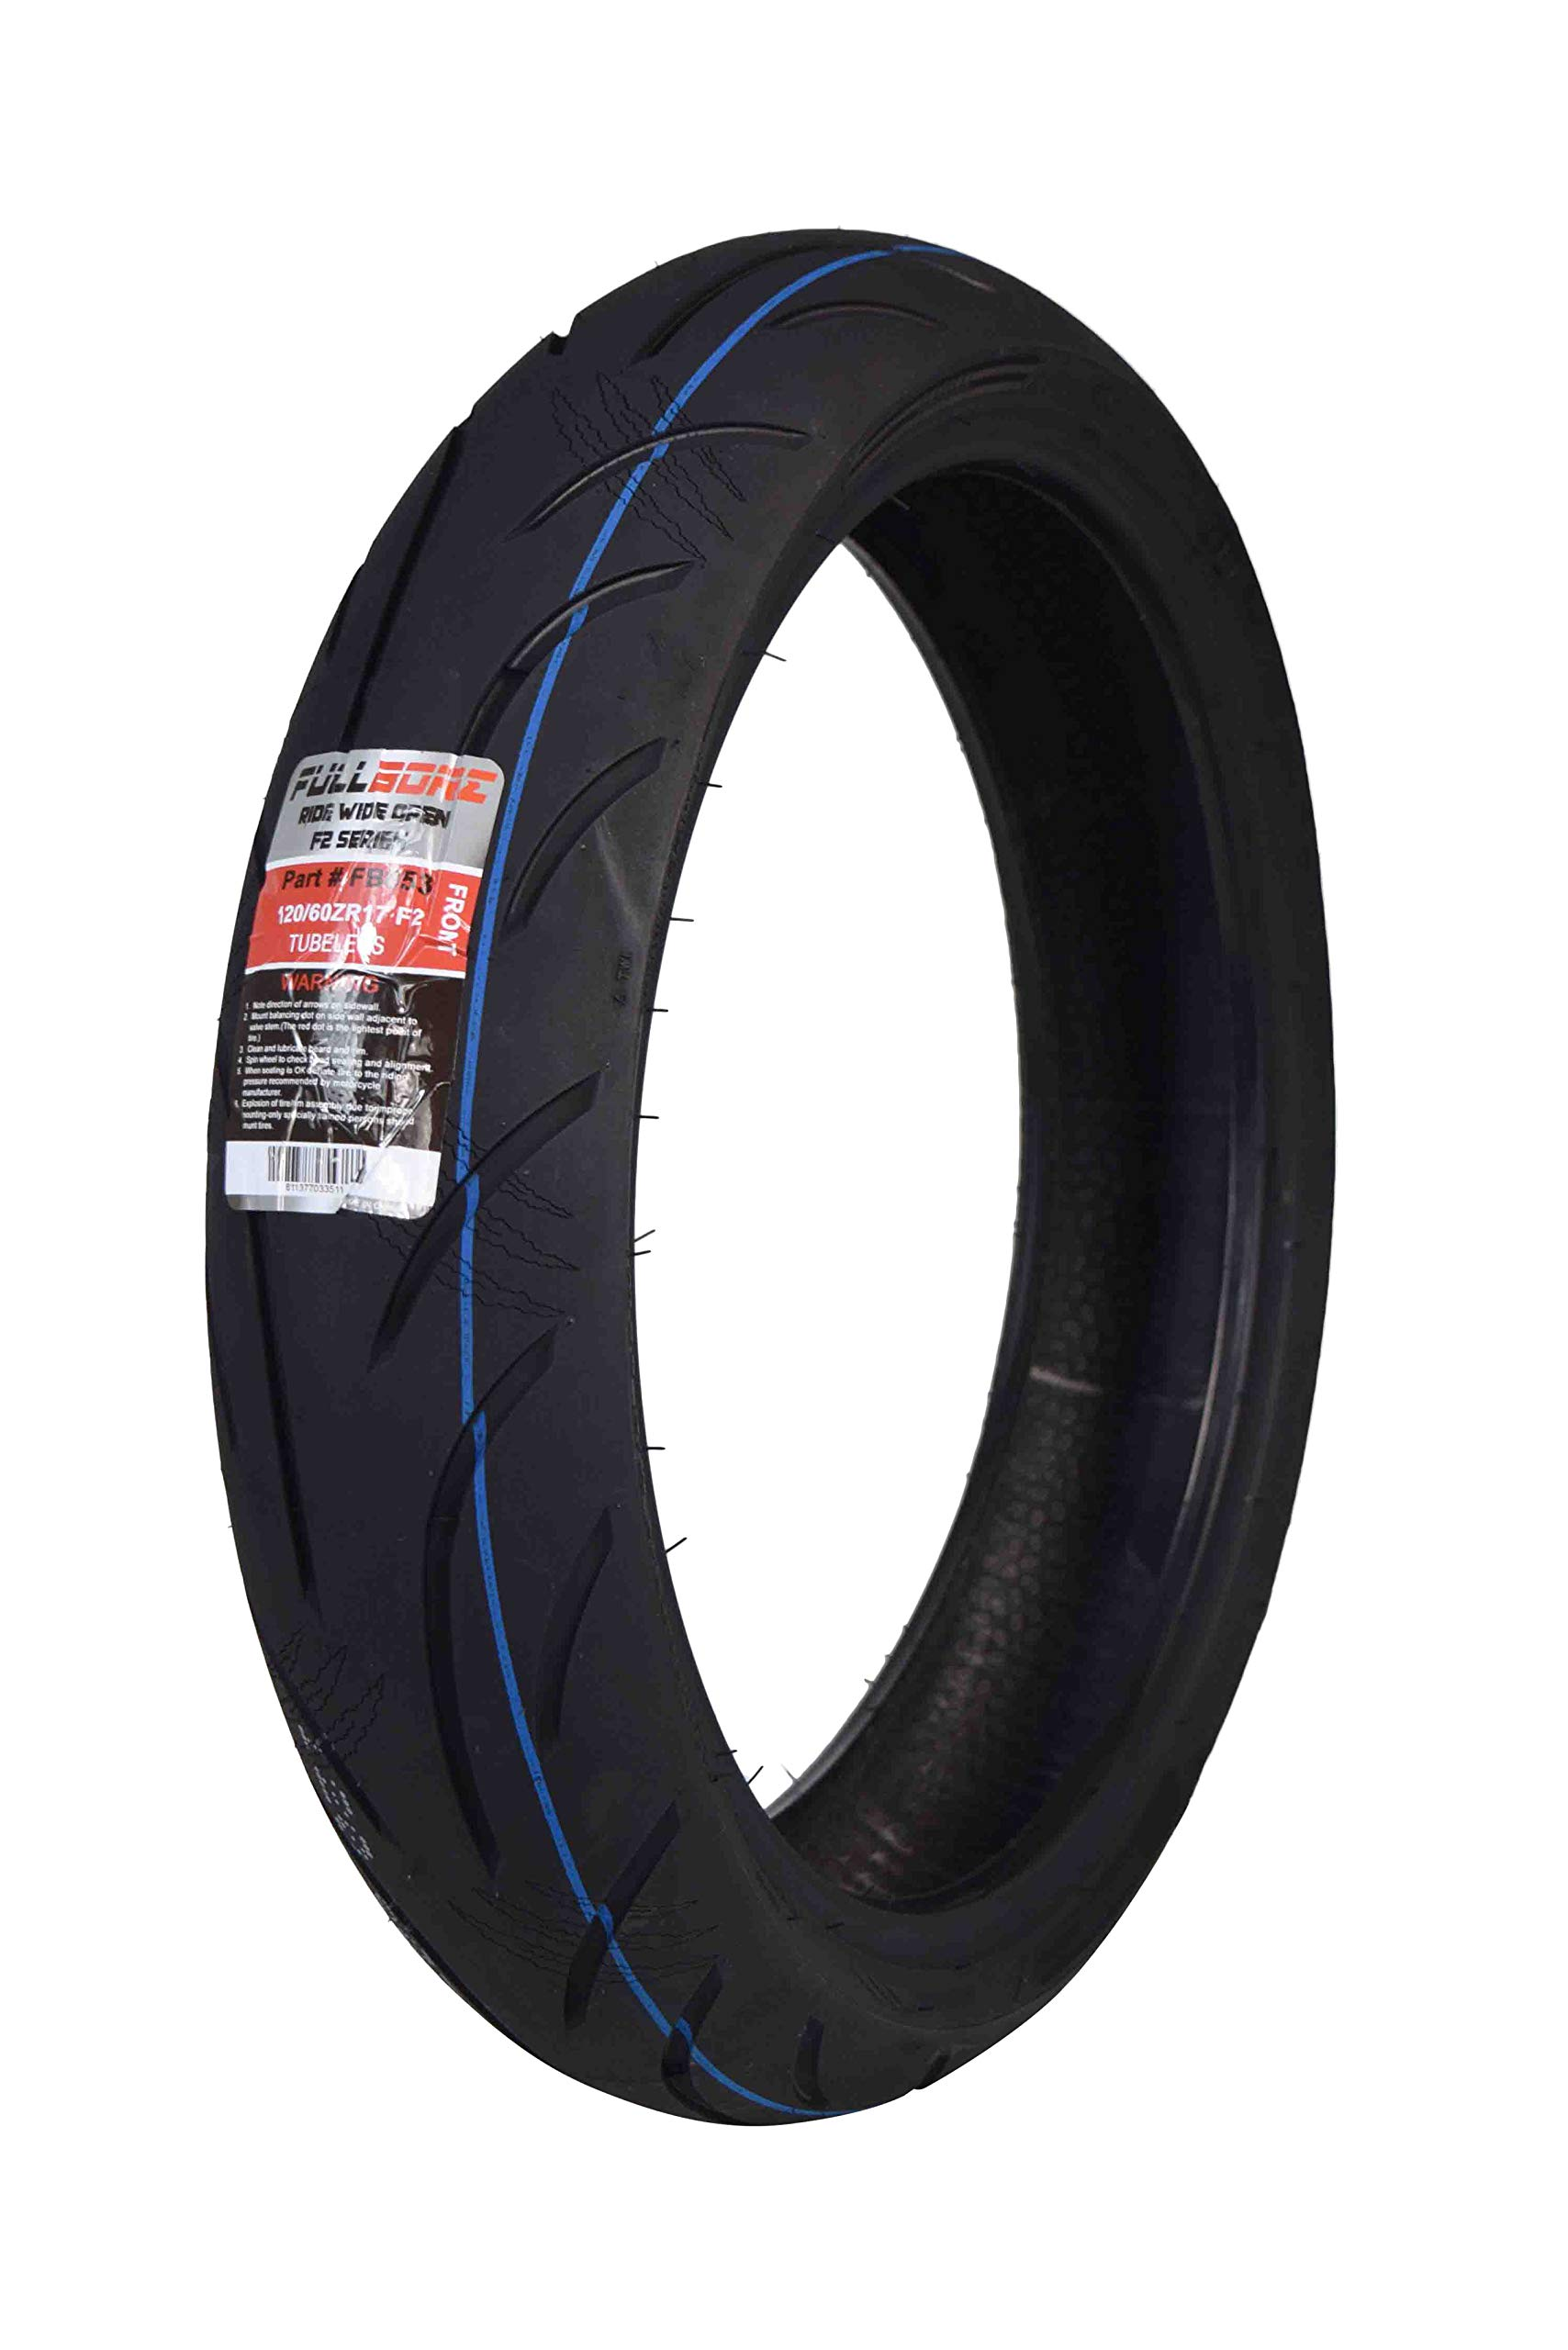 Full Bore F2 Sport Bike Radial Motorcycle Tire (120/60ZR17)